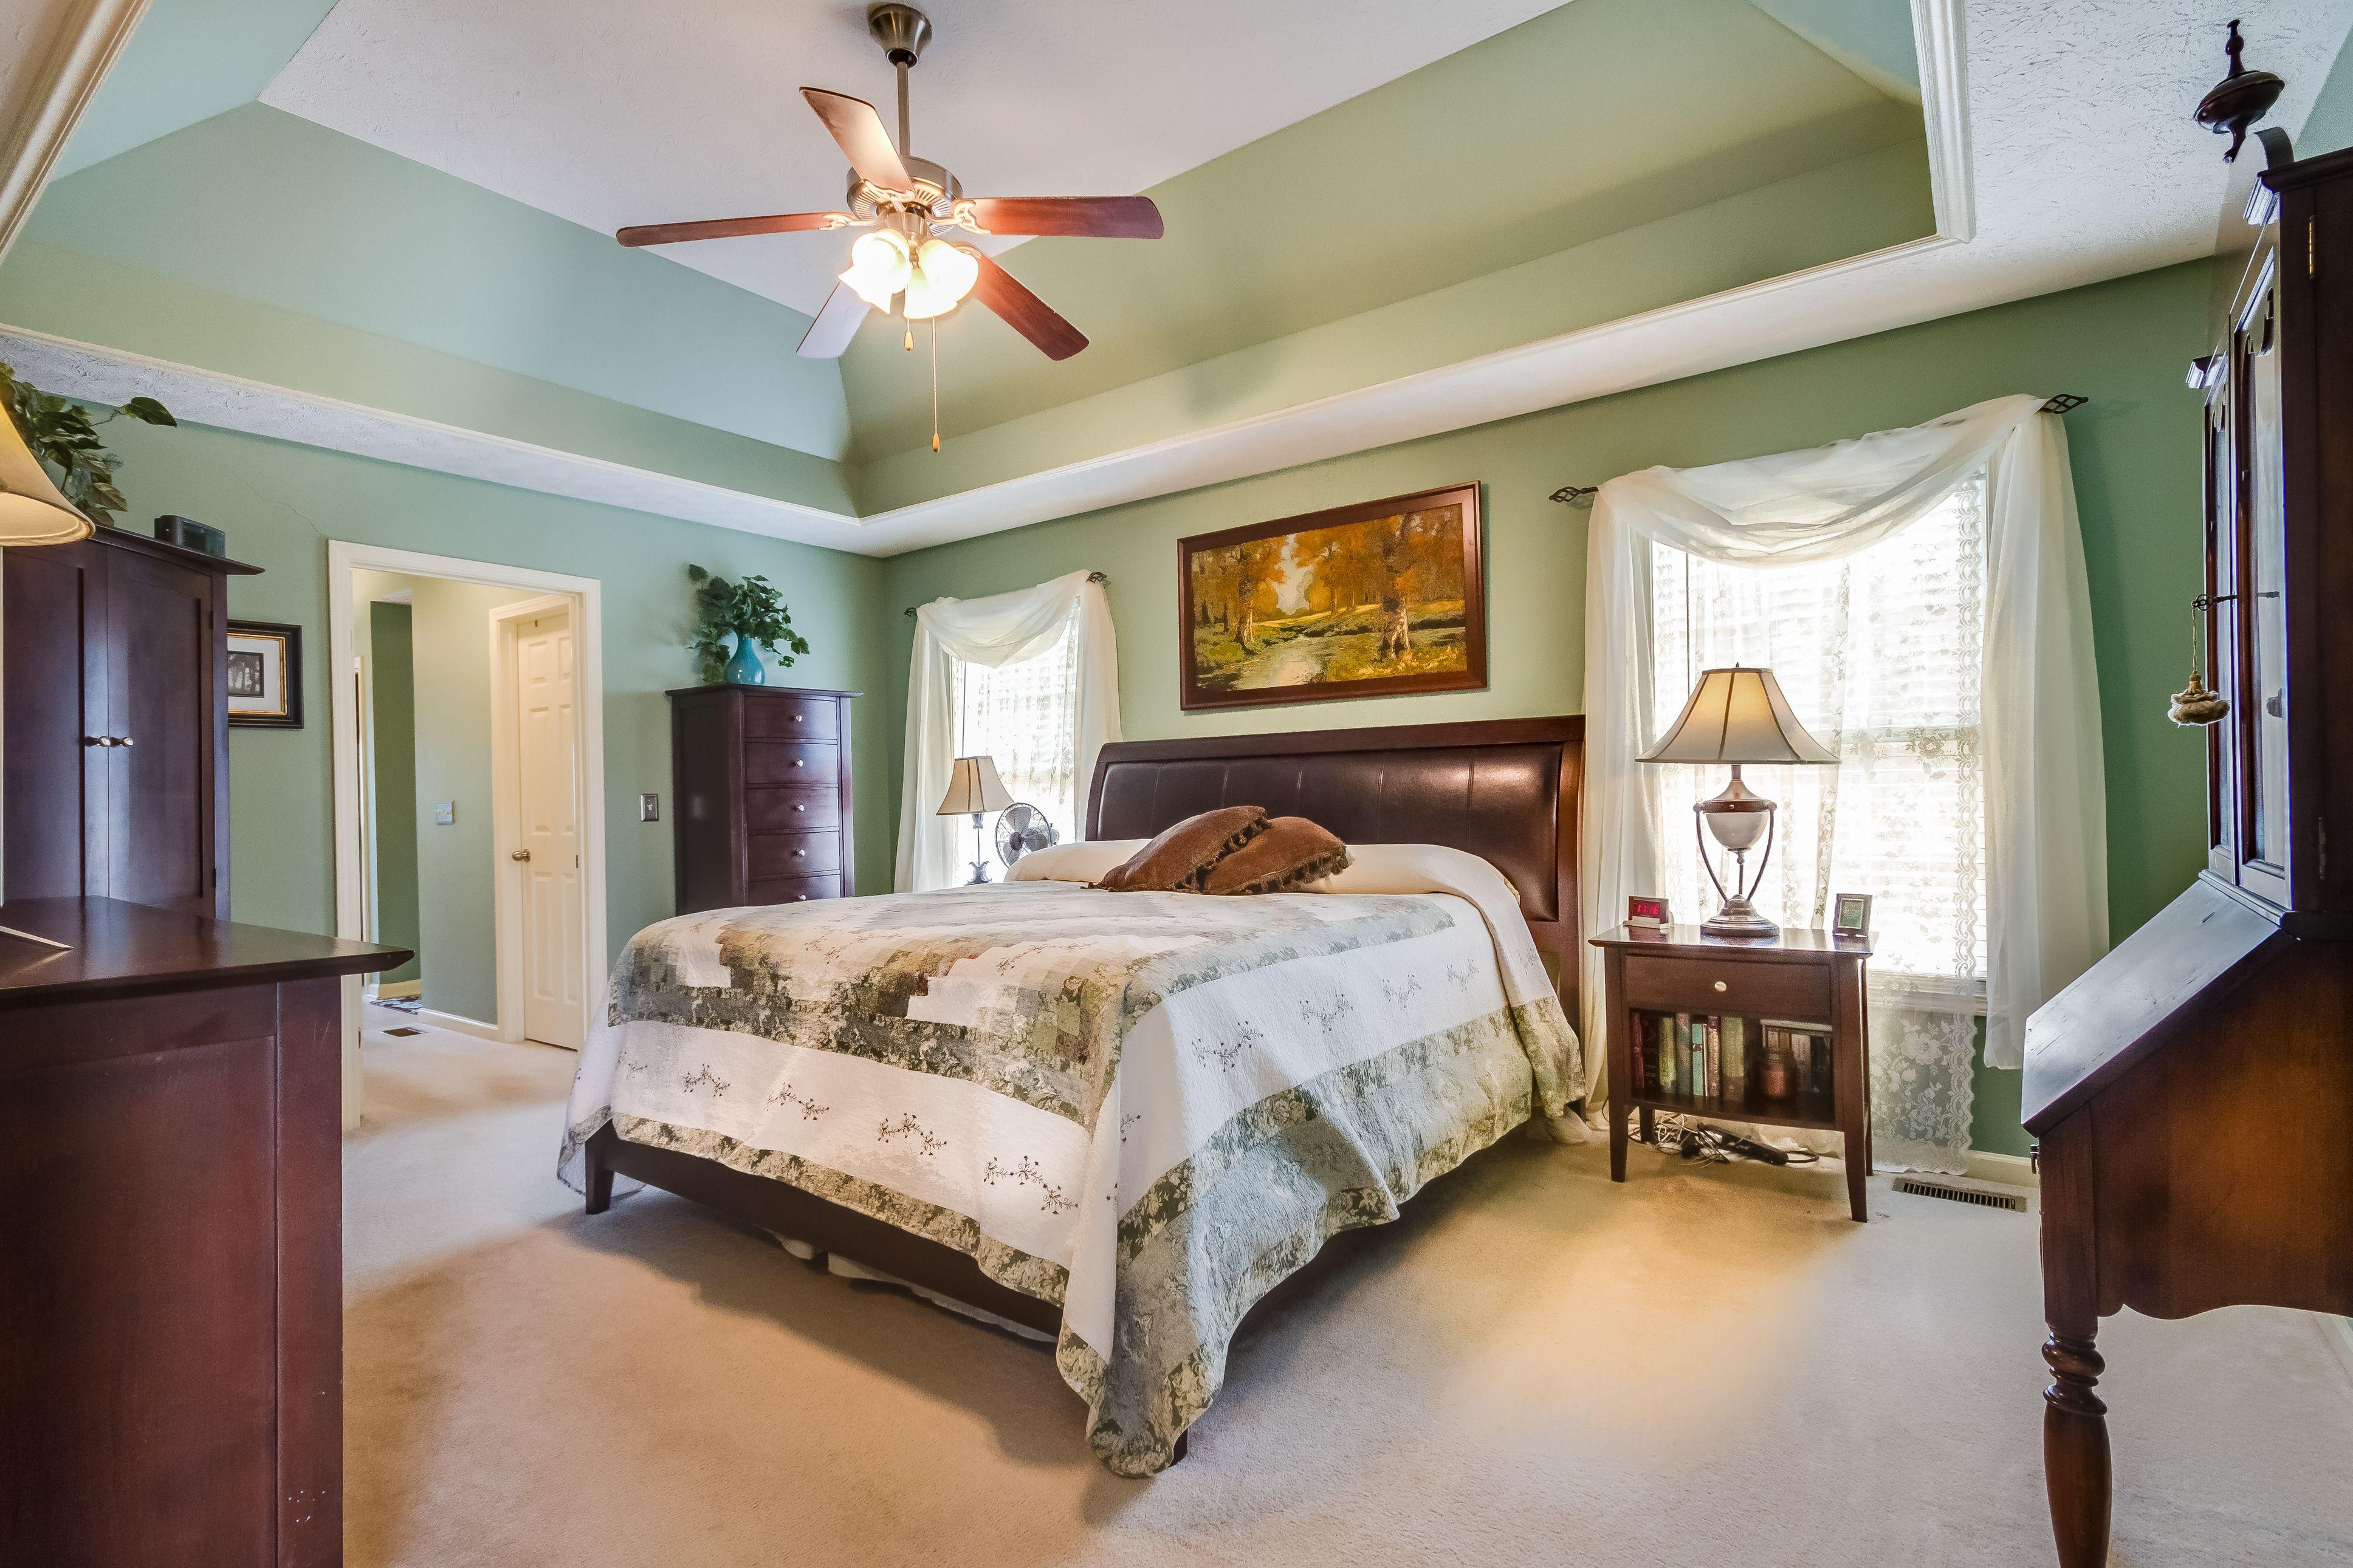 #bedroom #masterbedroom #naturallight #interior #home #interiordesign #realestate #photography #nashville